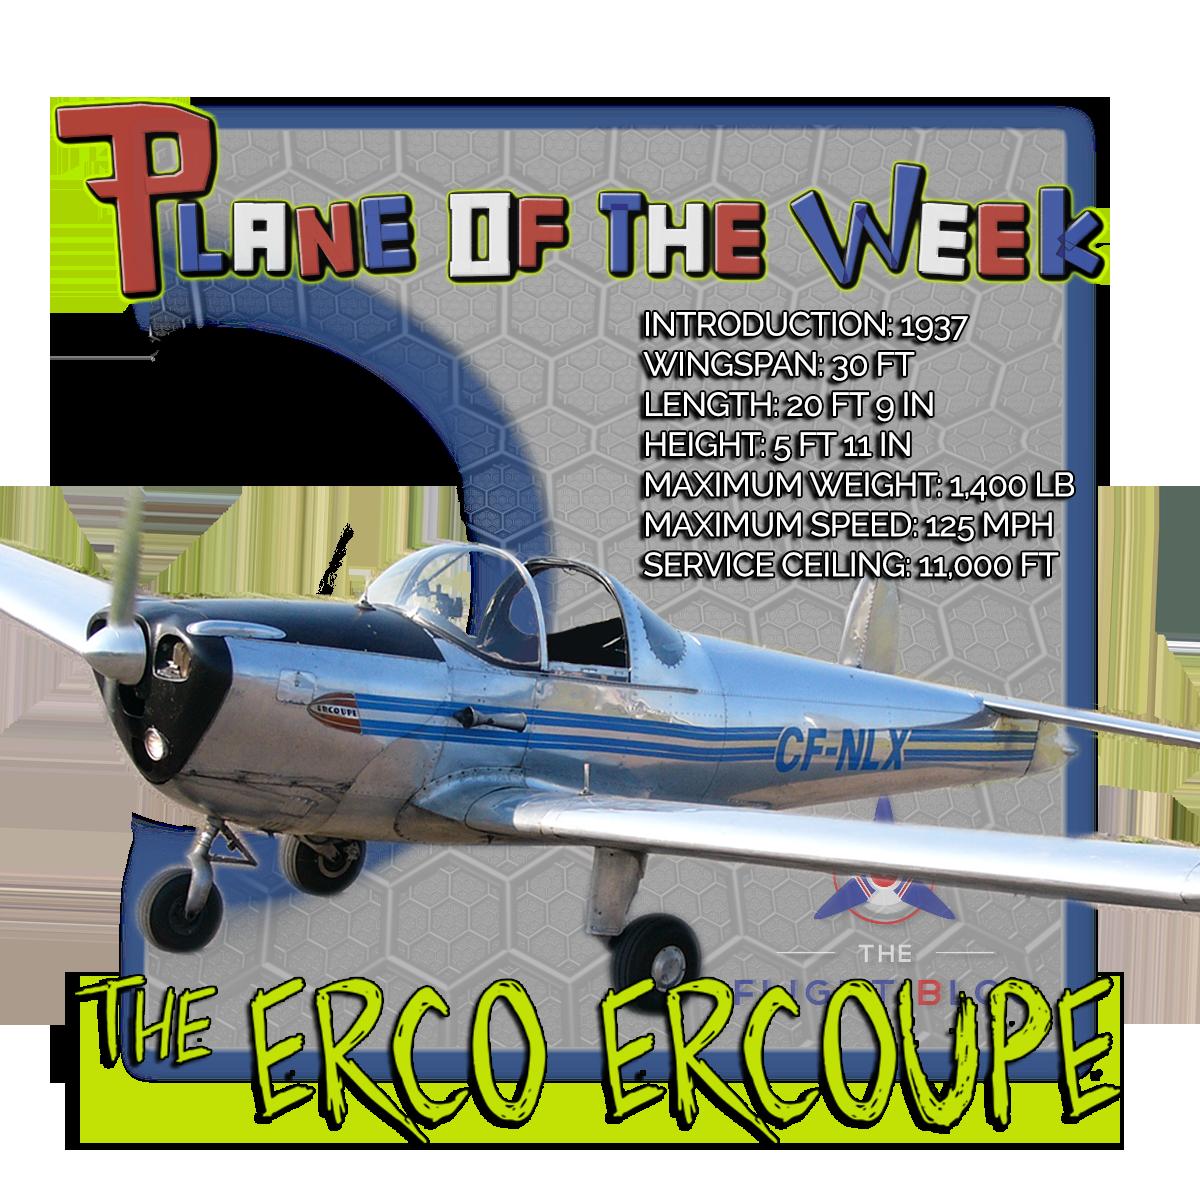 Plane of the week, erco, erco ercoupe, erco ercoupe plane specs